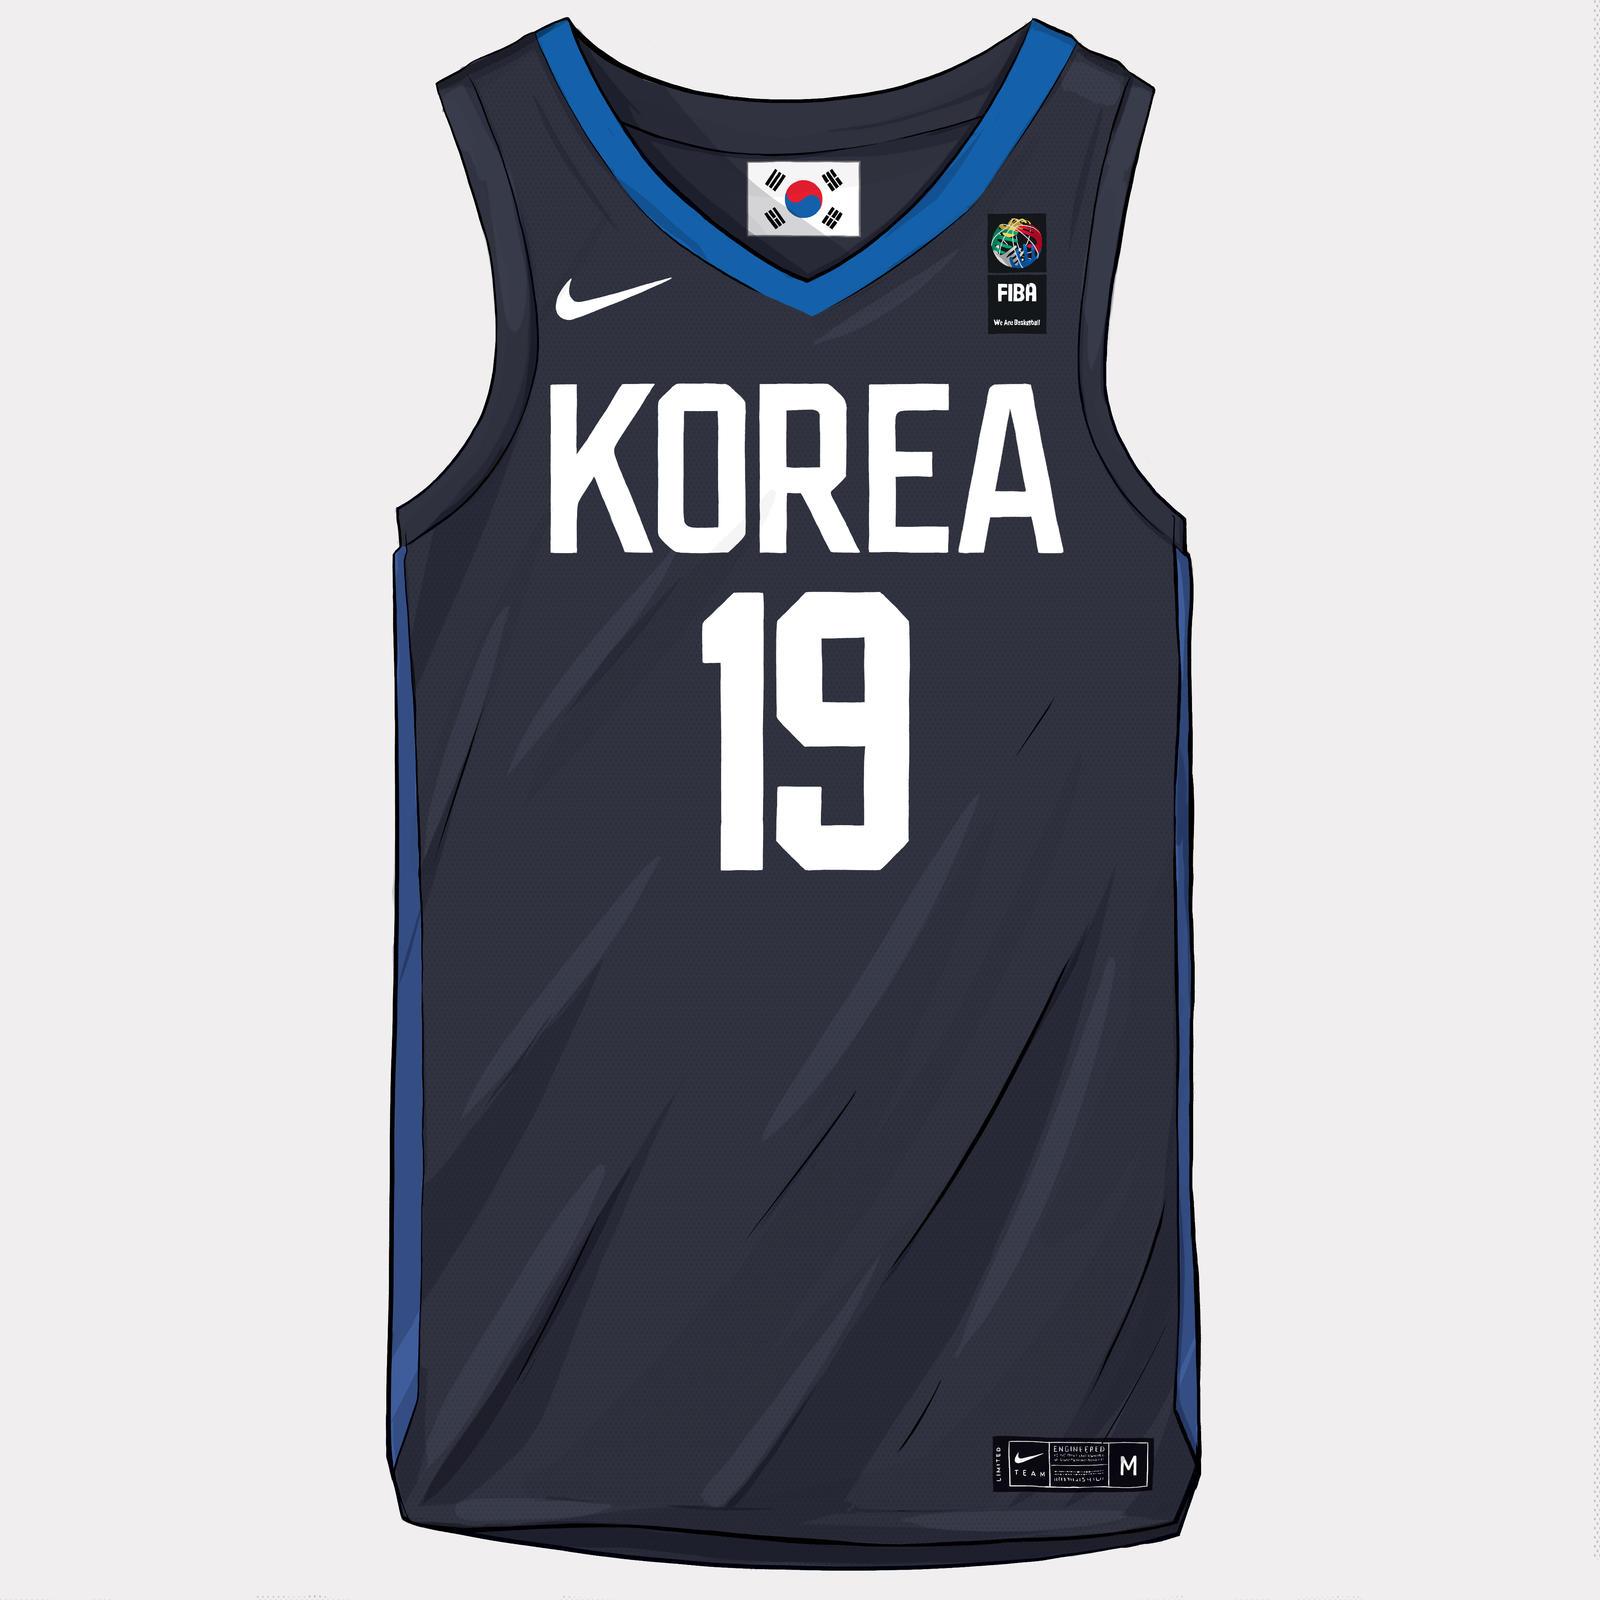 nike-news-korea-national-team-kit-2019-illustration-1x1_1_square_1600.jpg